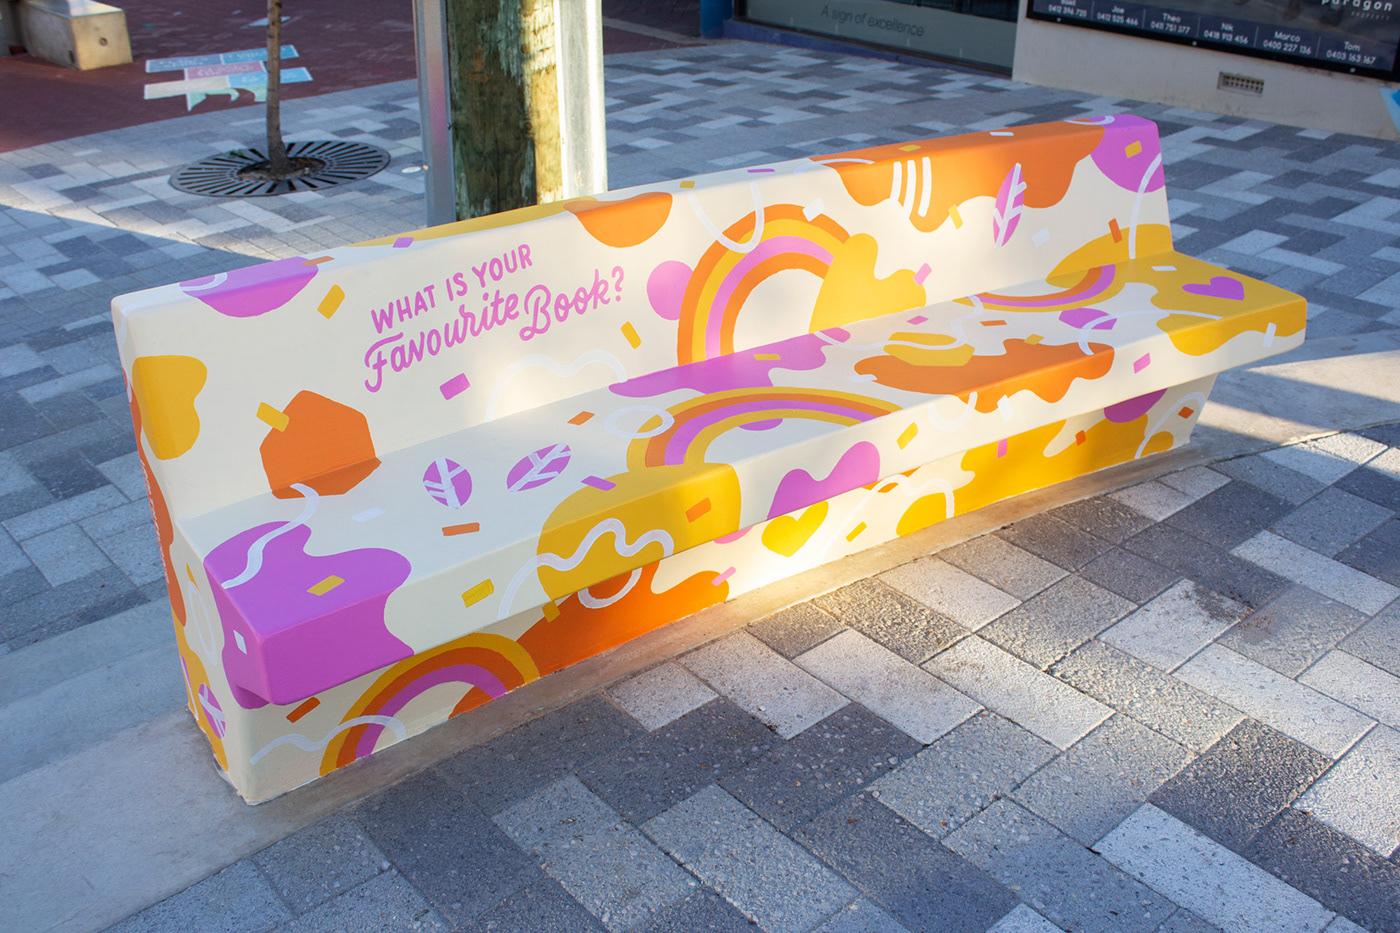 north perth perth Mural bench lettering type urban art bench art